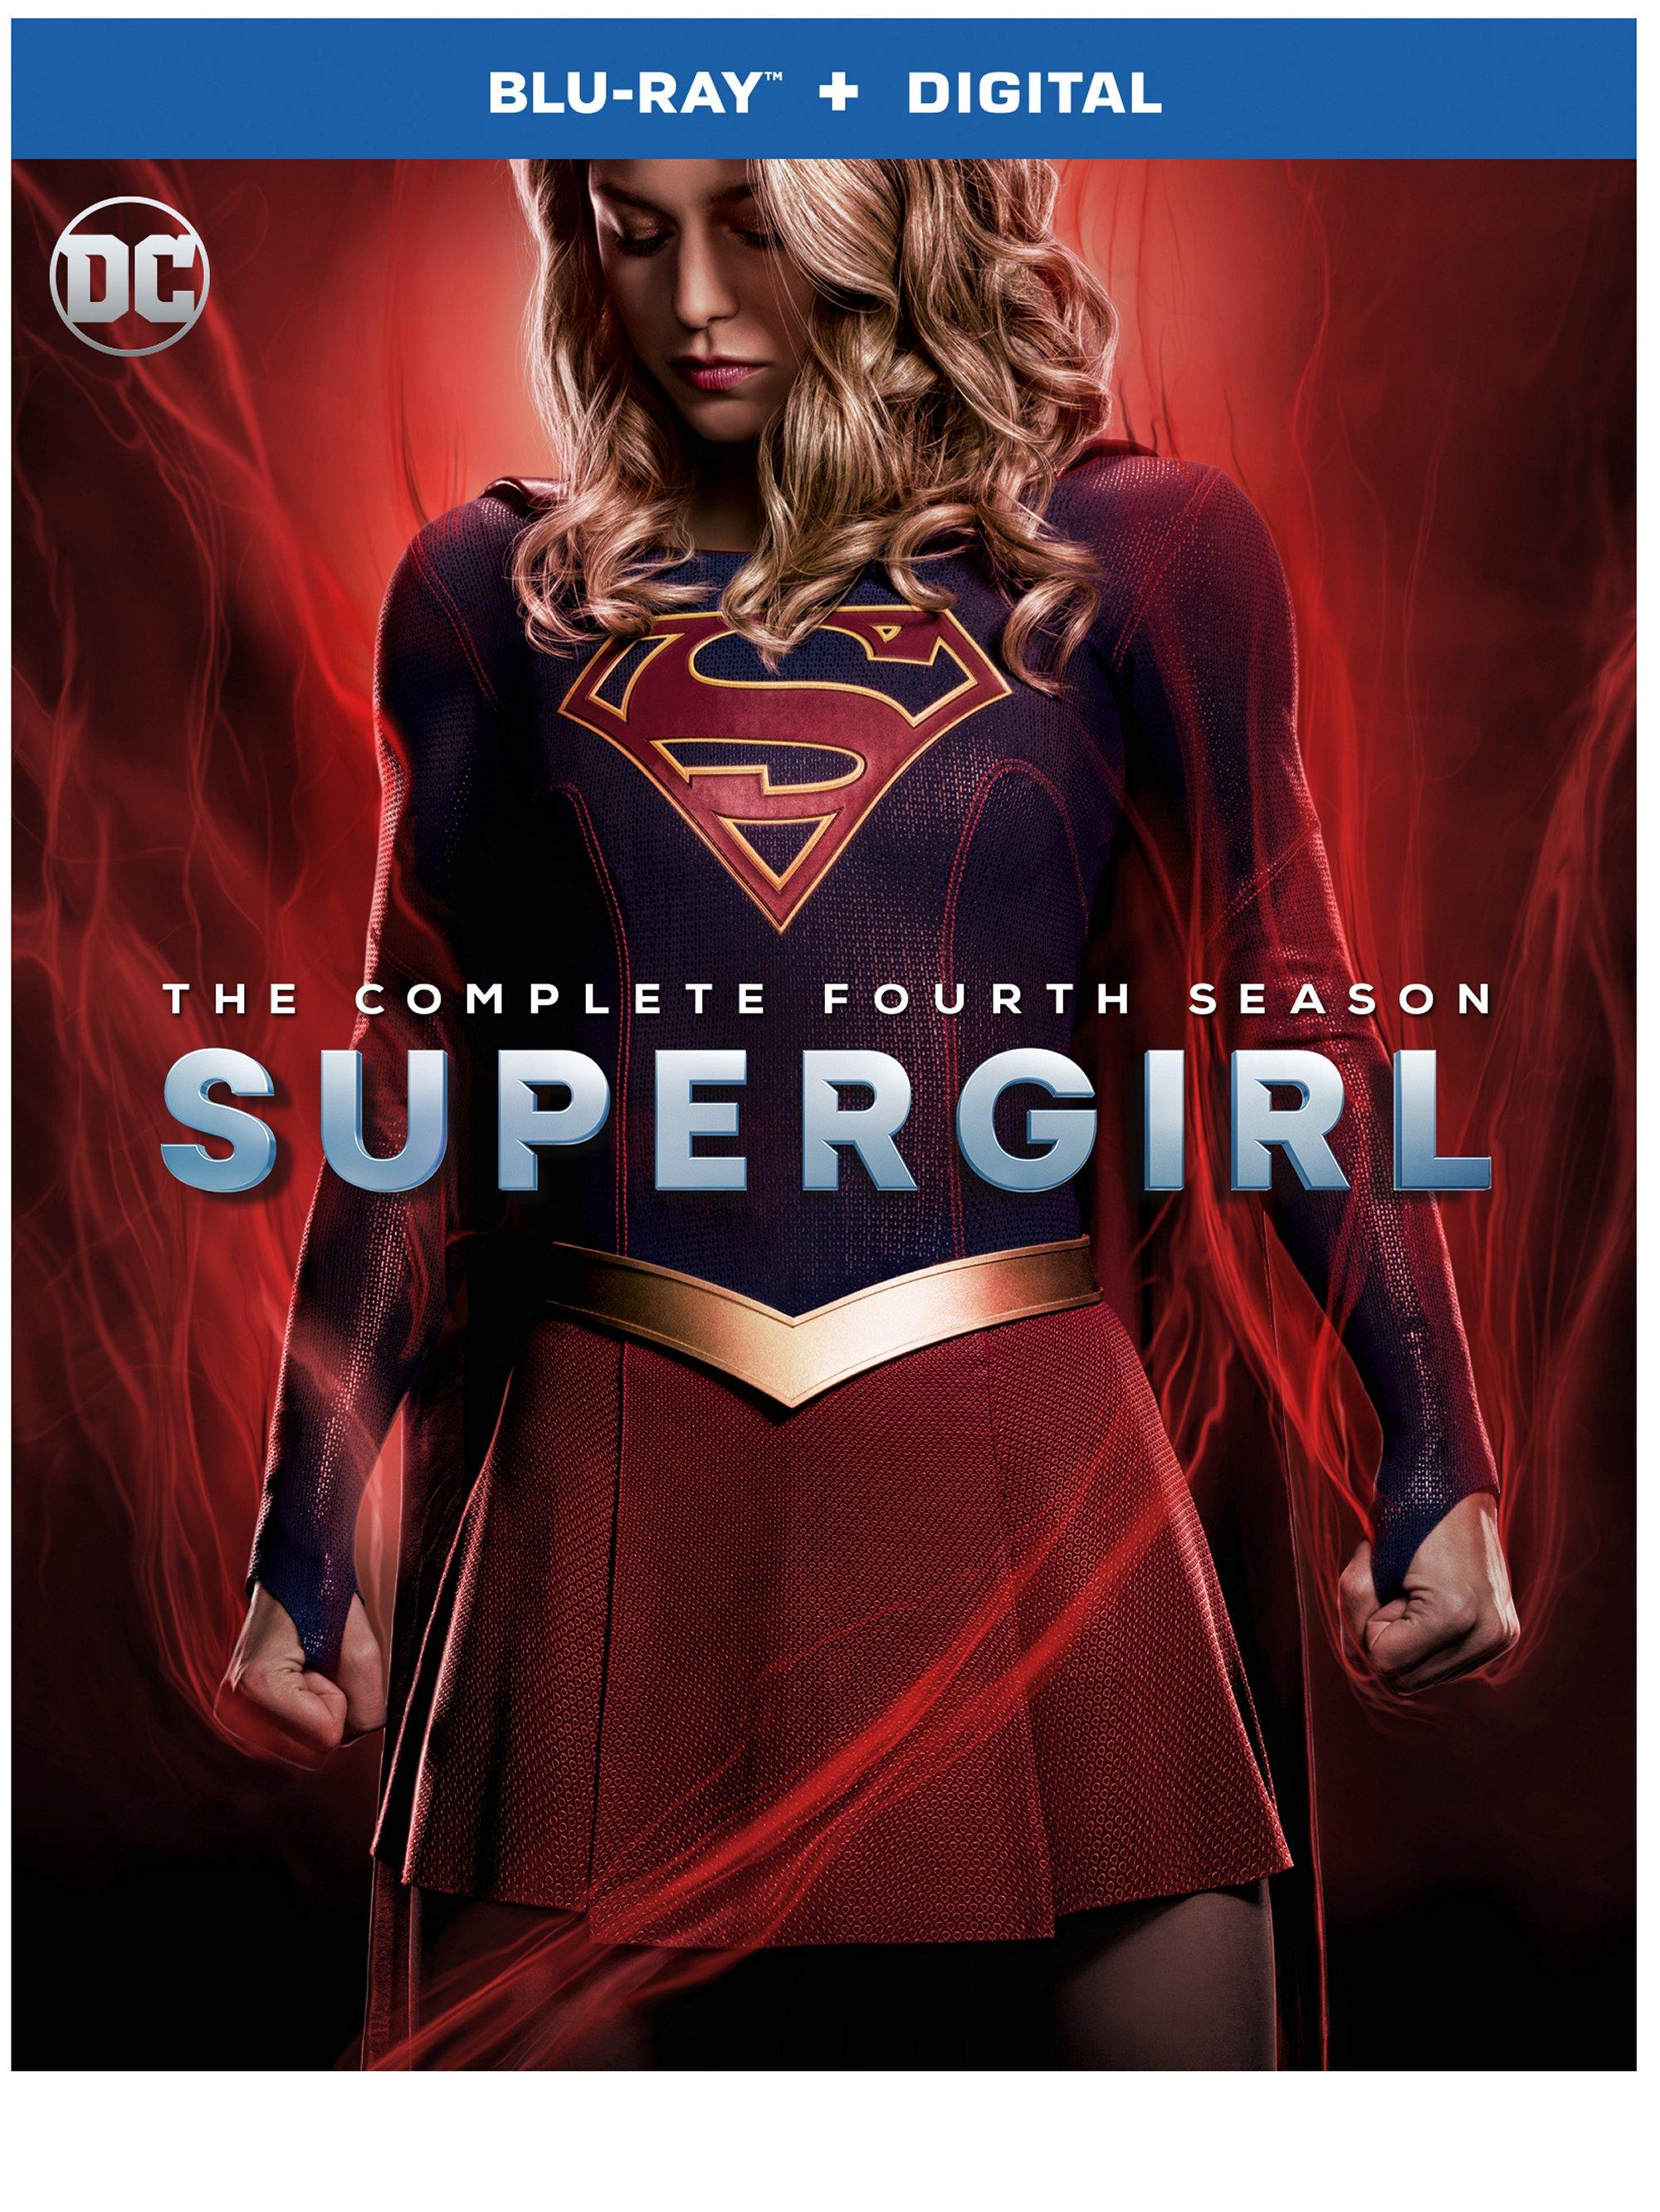 Supergirl S4 BD Box Art2.JPEG